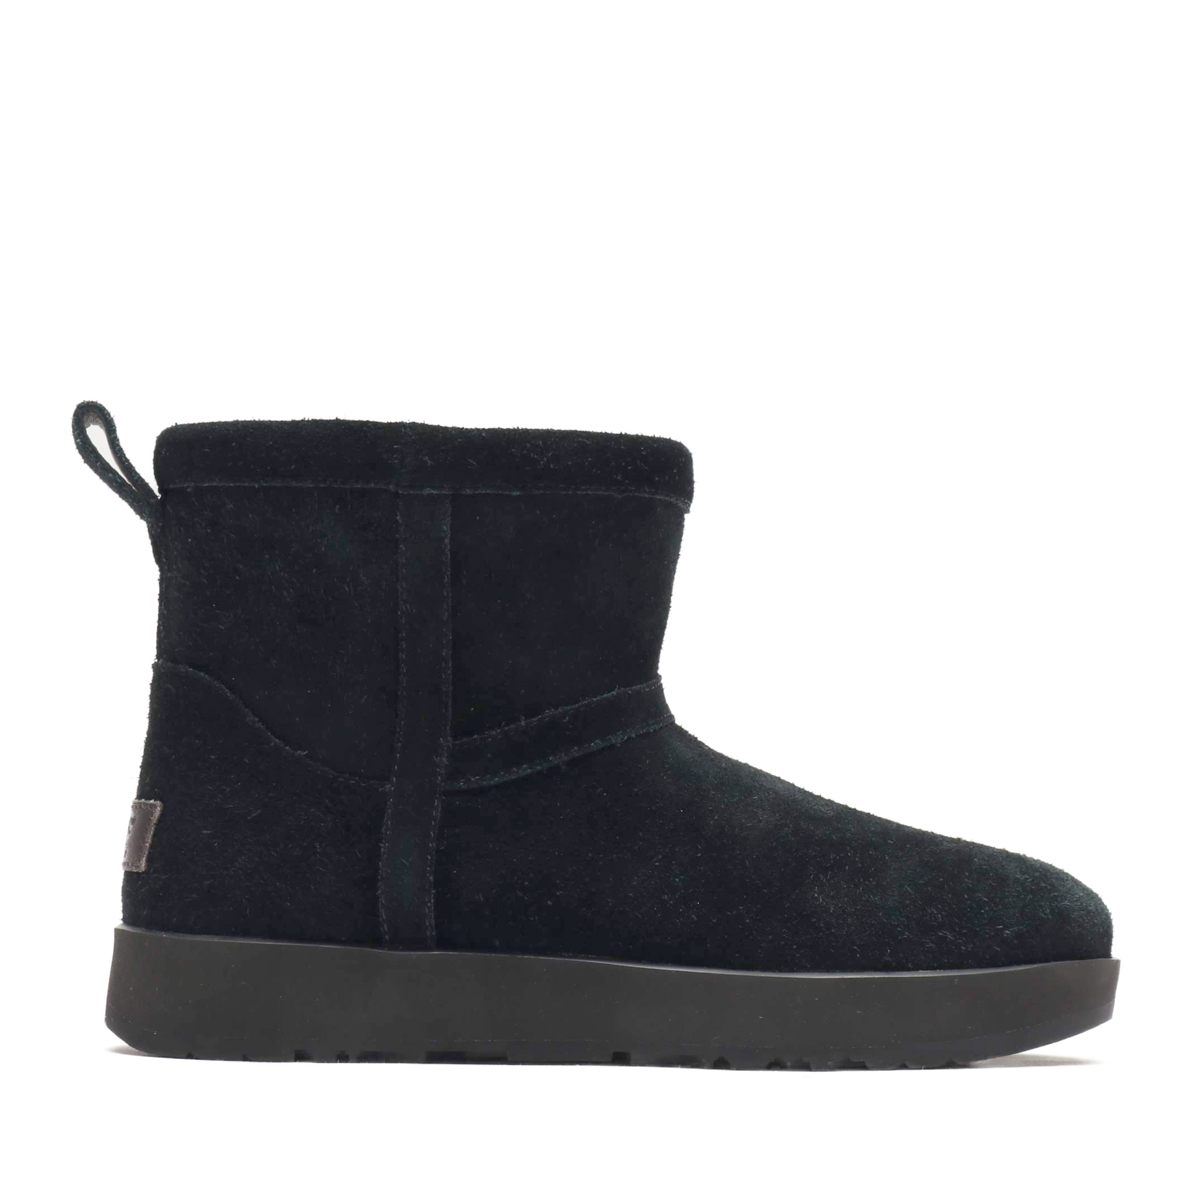 UGG W CLASSIC MINI WATERPROOF(BLACK)(アグ クラシック ミニ ウォータープルーフ)【レディース】【ブーツ】【18FW-I】